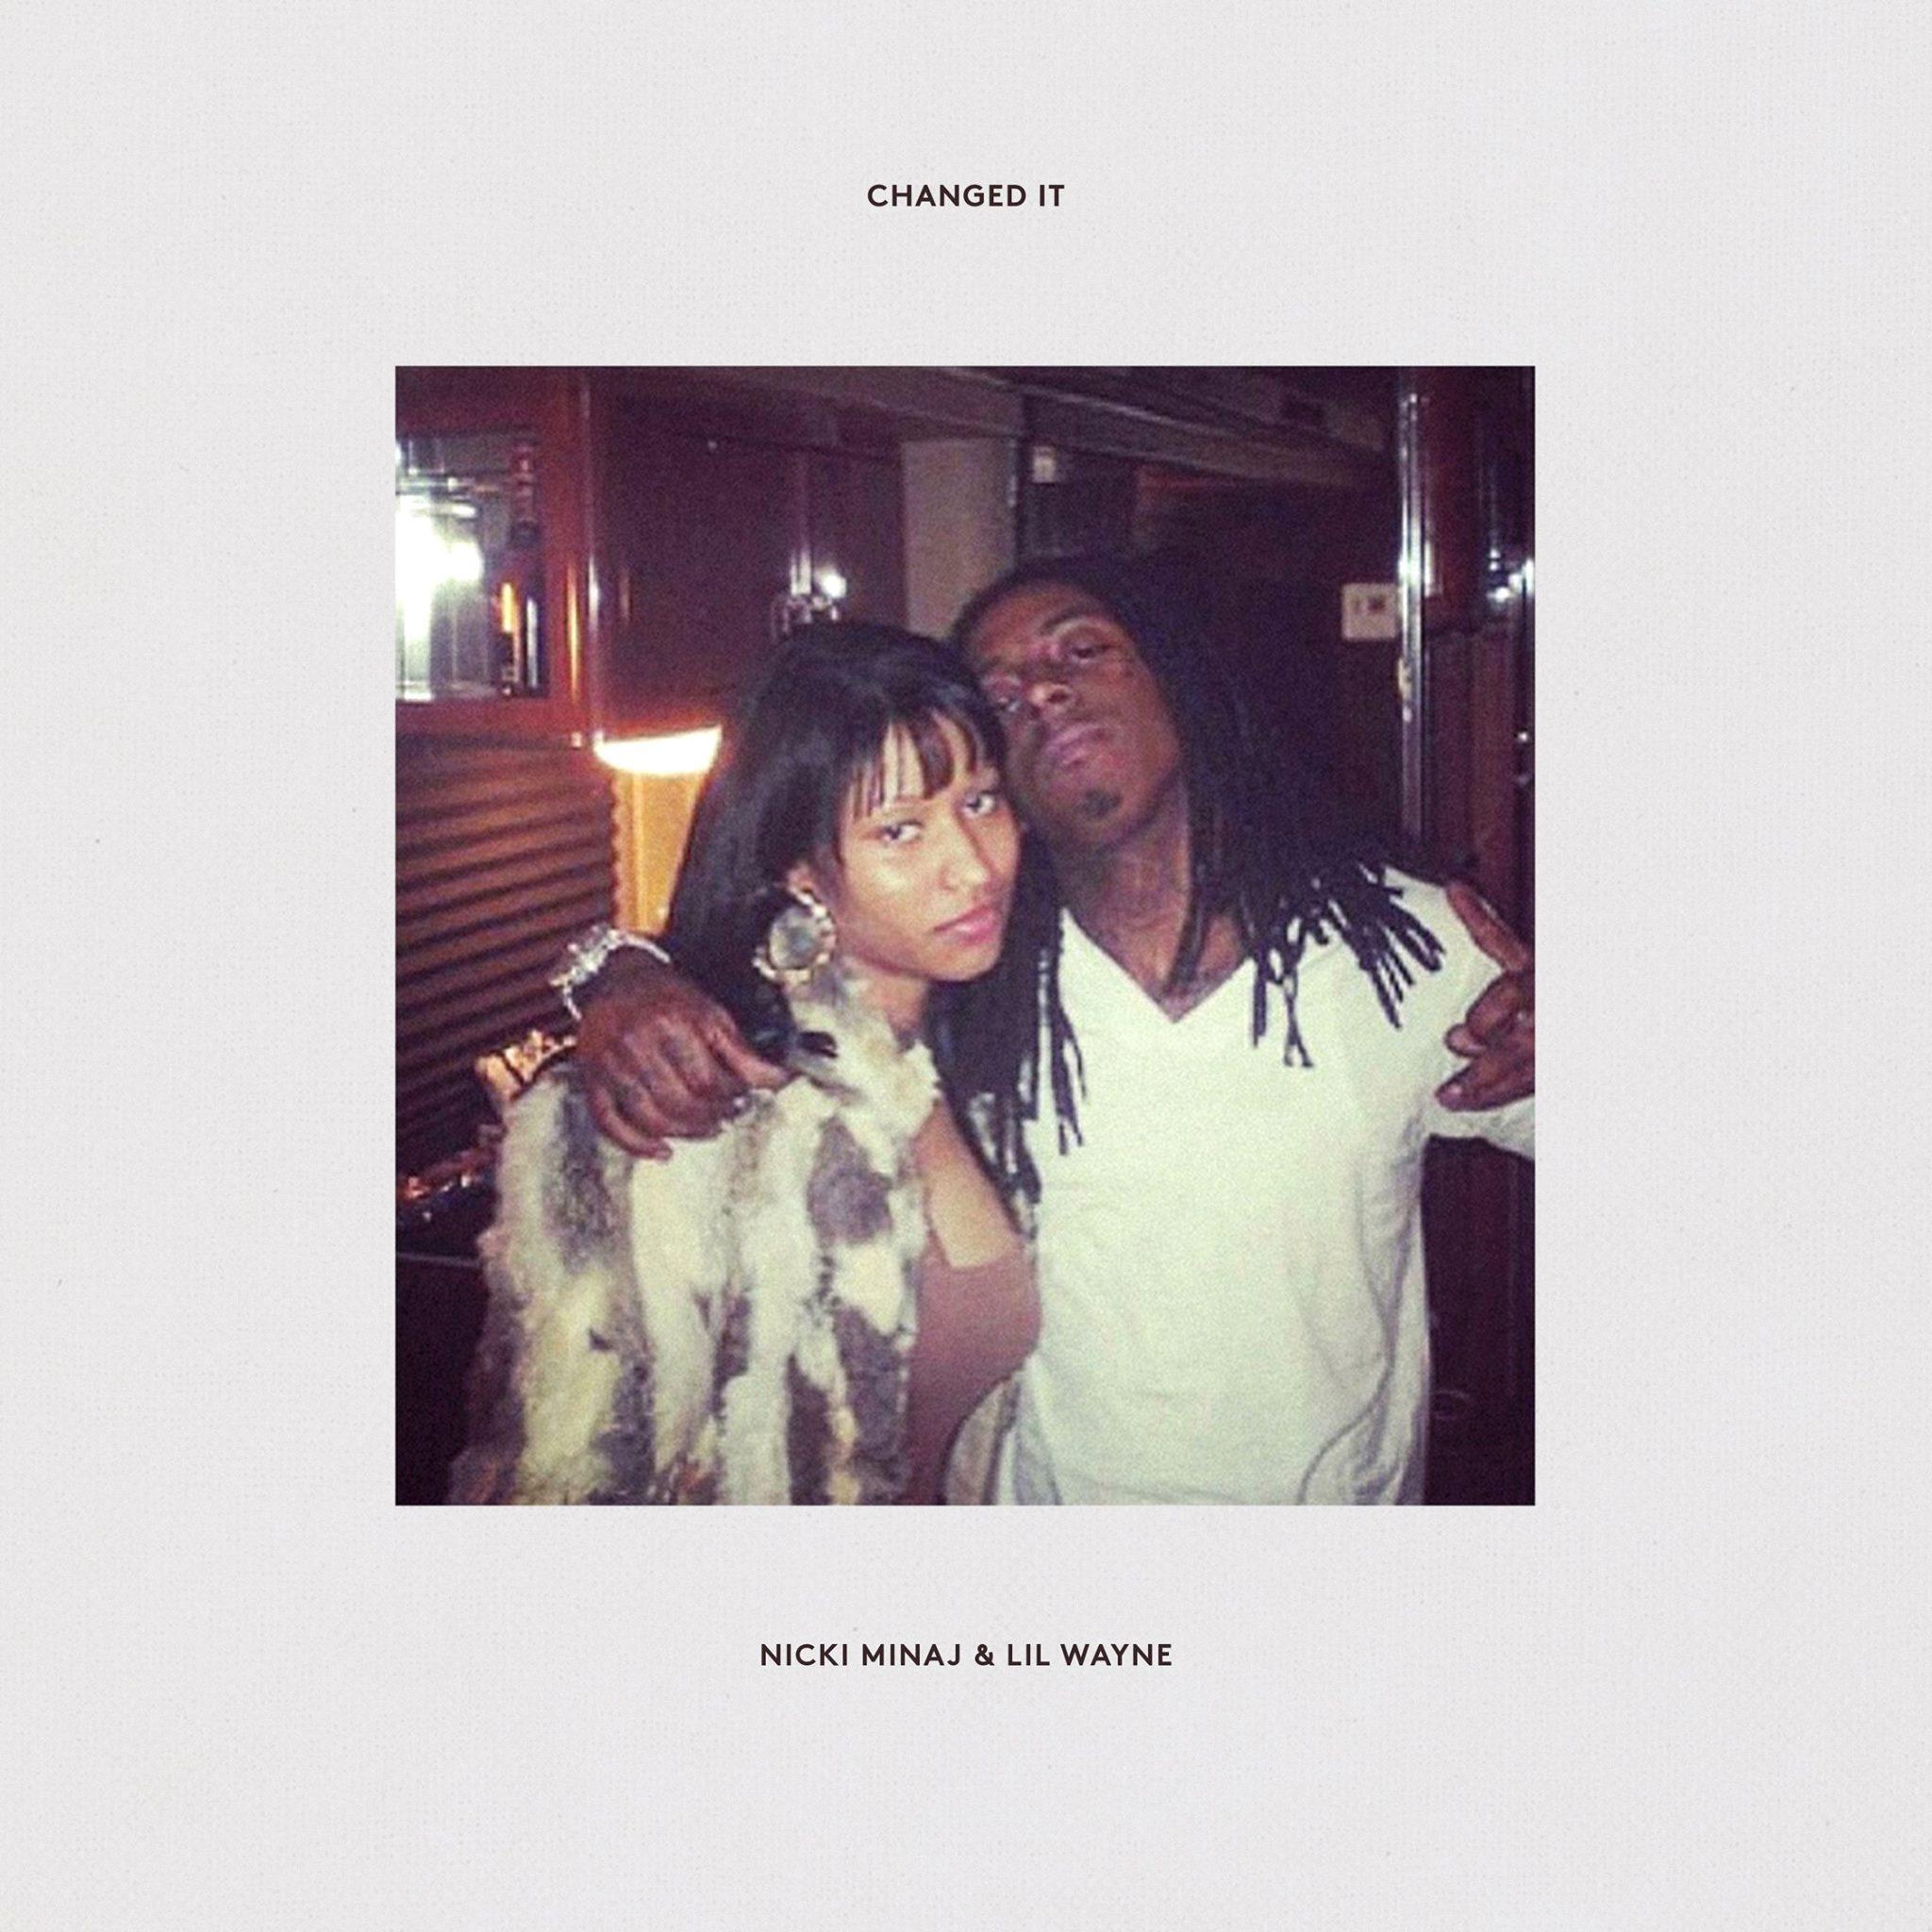 Track Review: Nicki Minaj & Lil Wayne, 'Changed It'